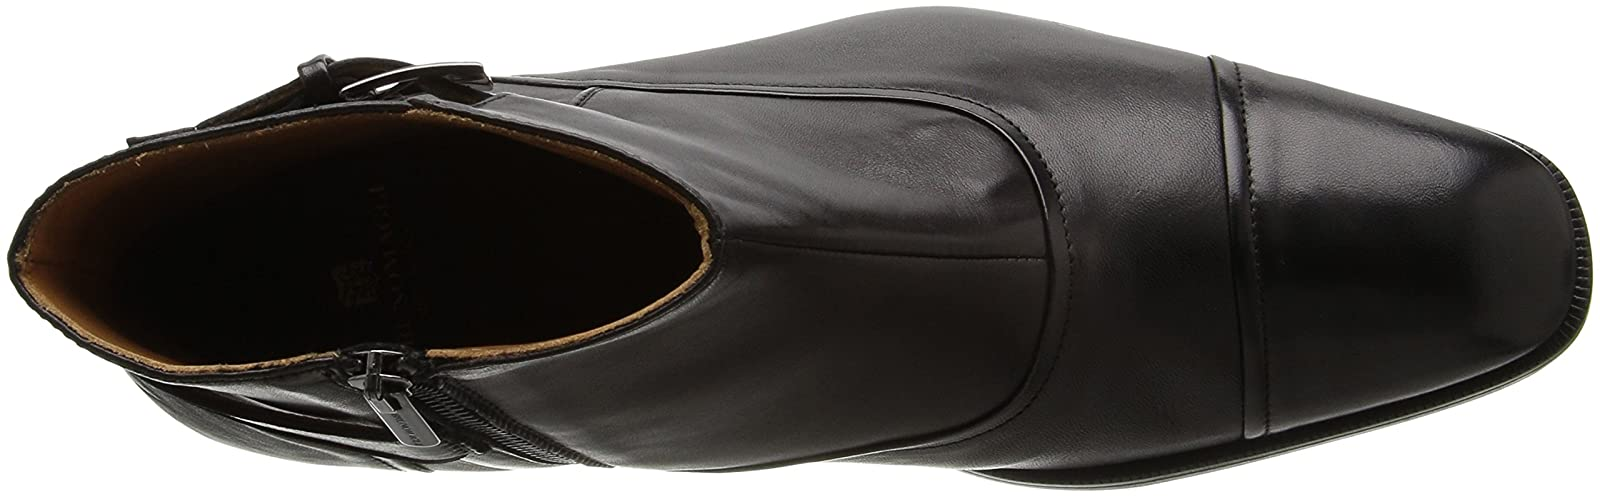 Bruno Magli Men's Arcadia Boot 11.5 M US - 8